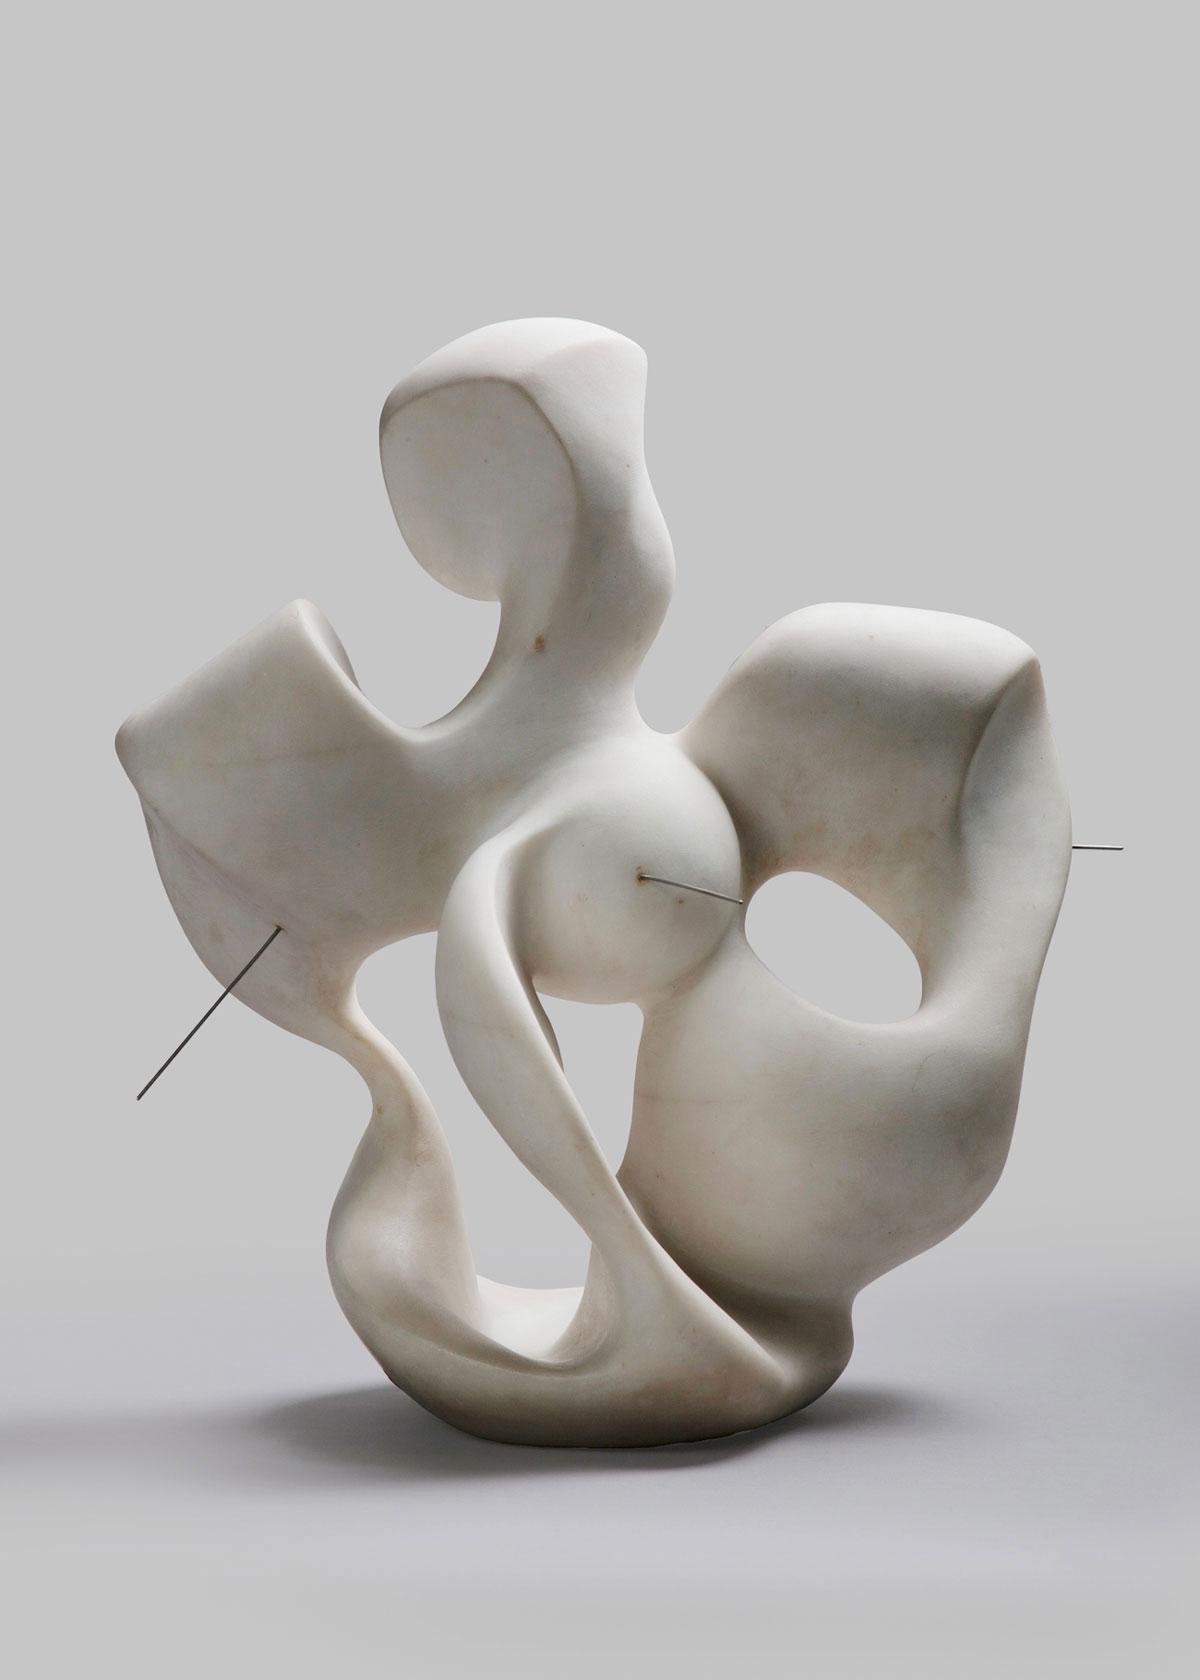 Georges Vantongerloo, <i>Constructions dans une sphère</i>, 1963–1964